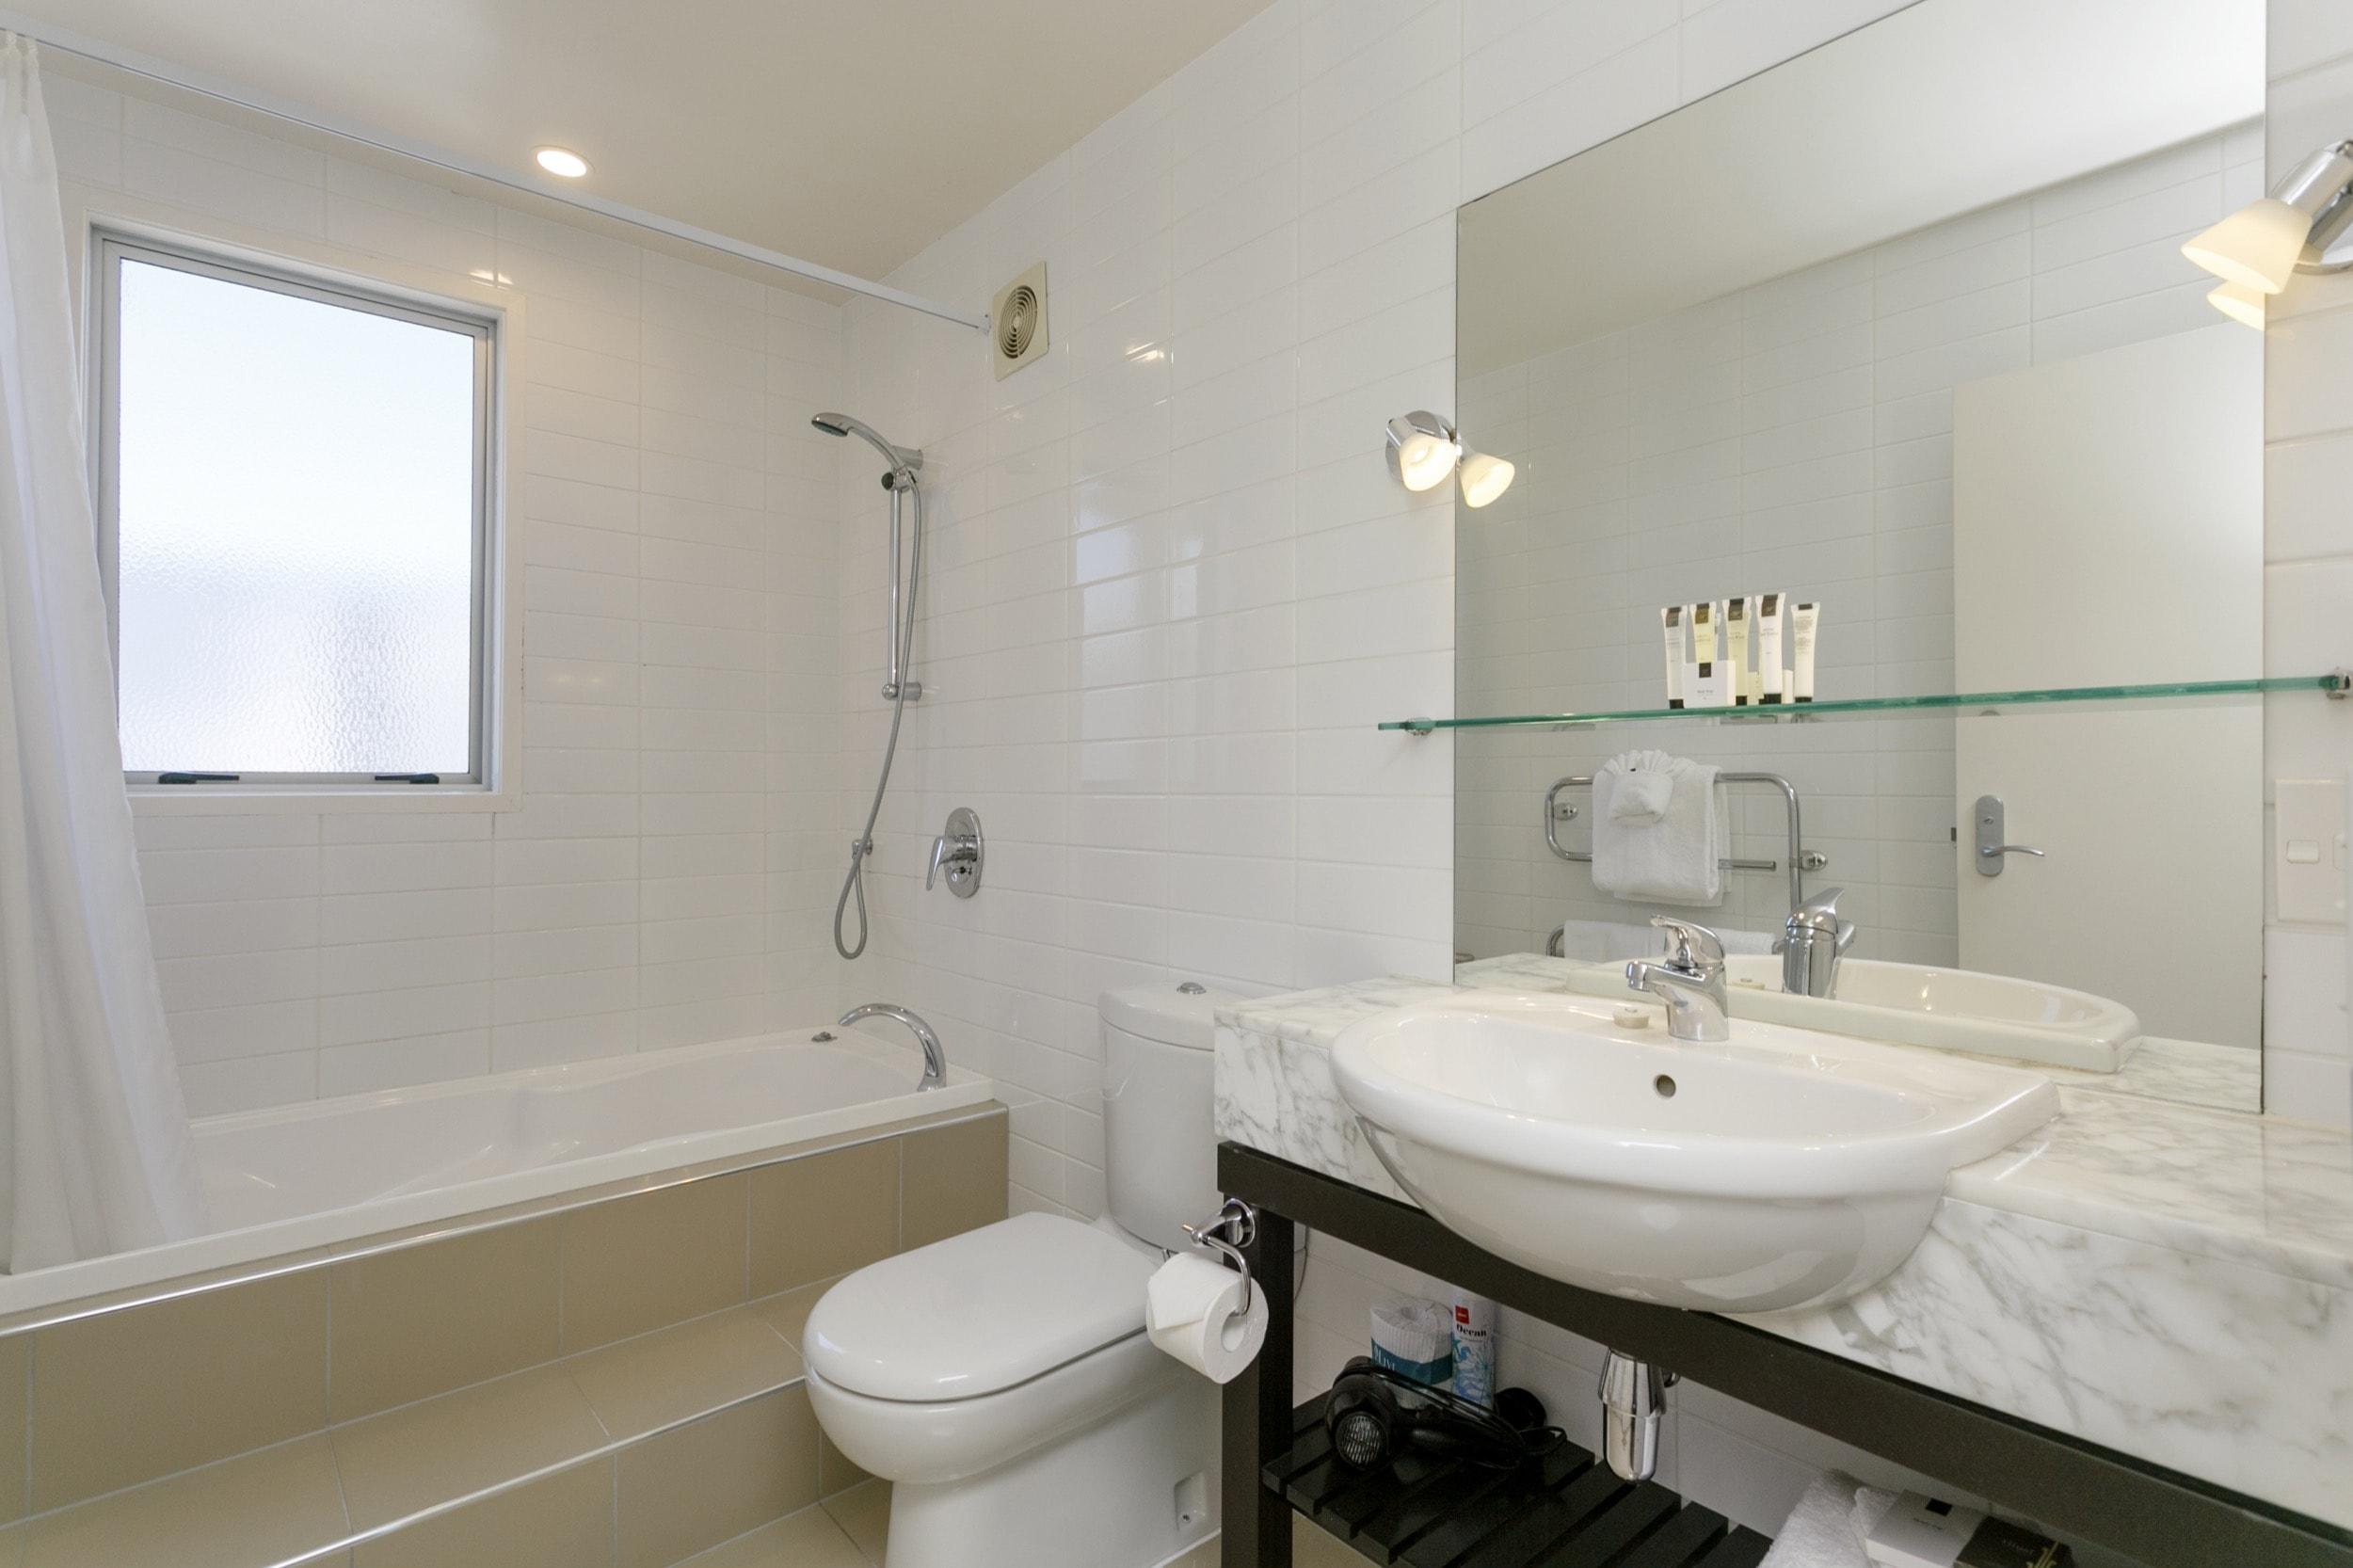 One Bedroom Gardev View bathrooms showing spa bath 2-min.jpg